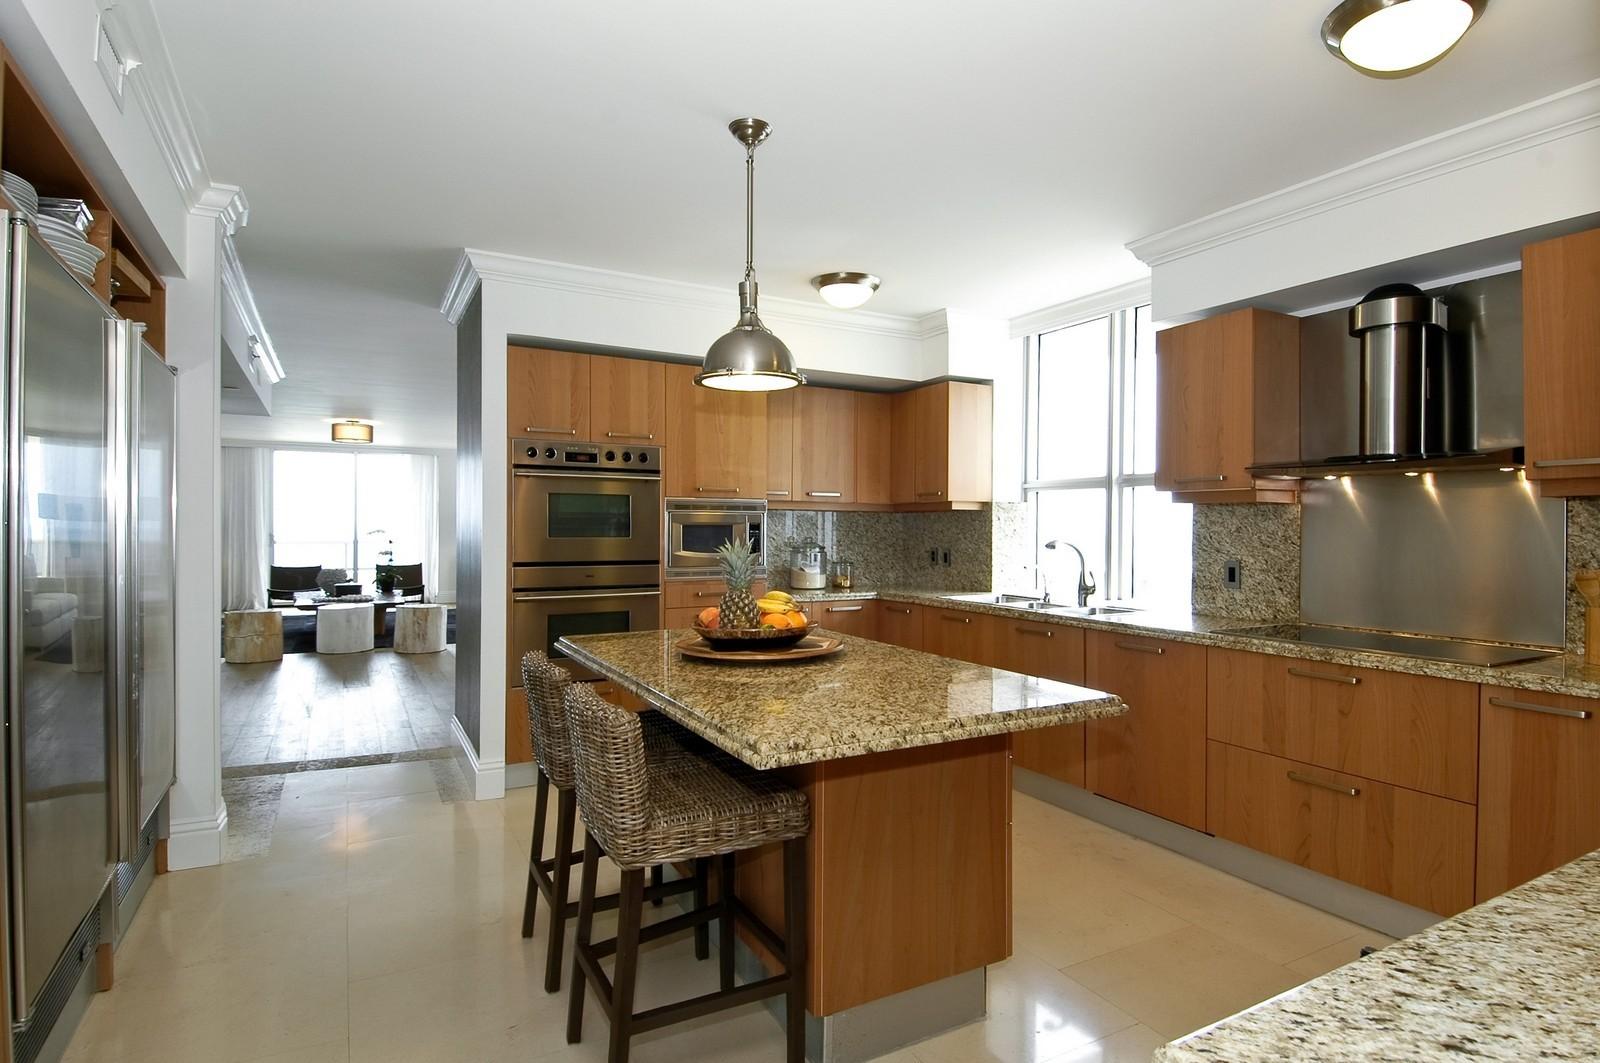 Real Estate Photography - 5801 Collins Ave, Unit 1000, Miami Beach, FL, 33140 - Kitchen